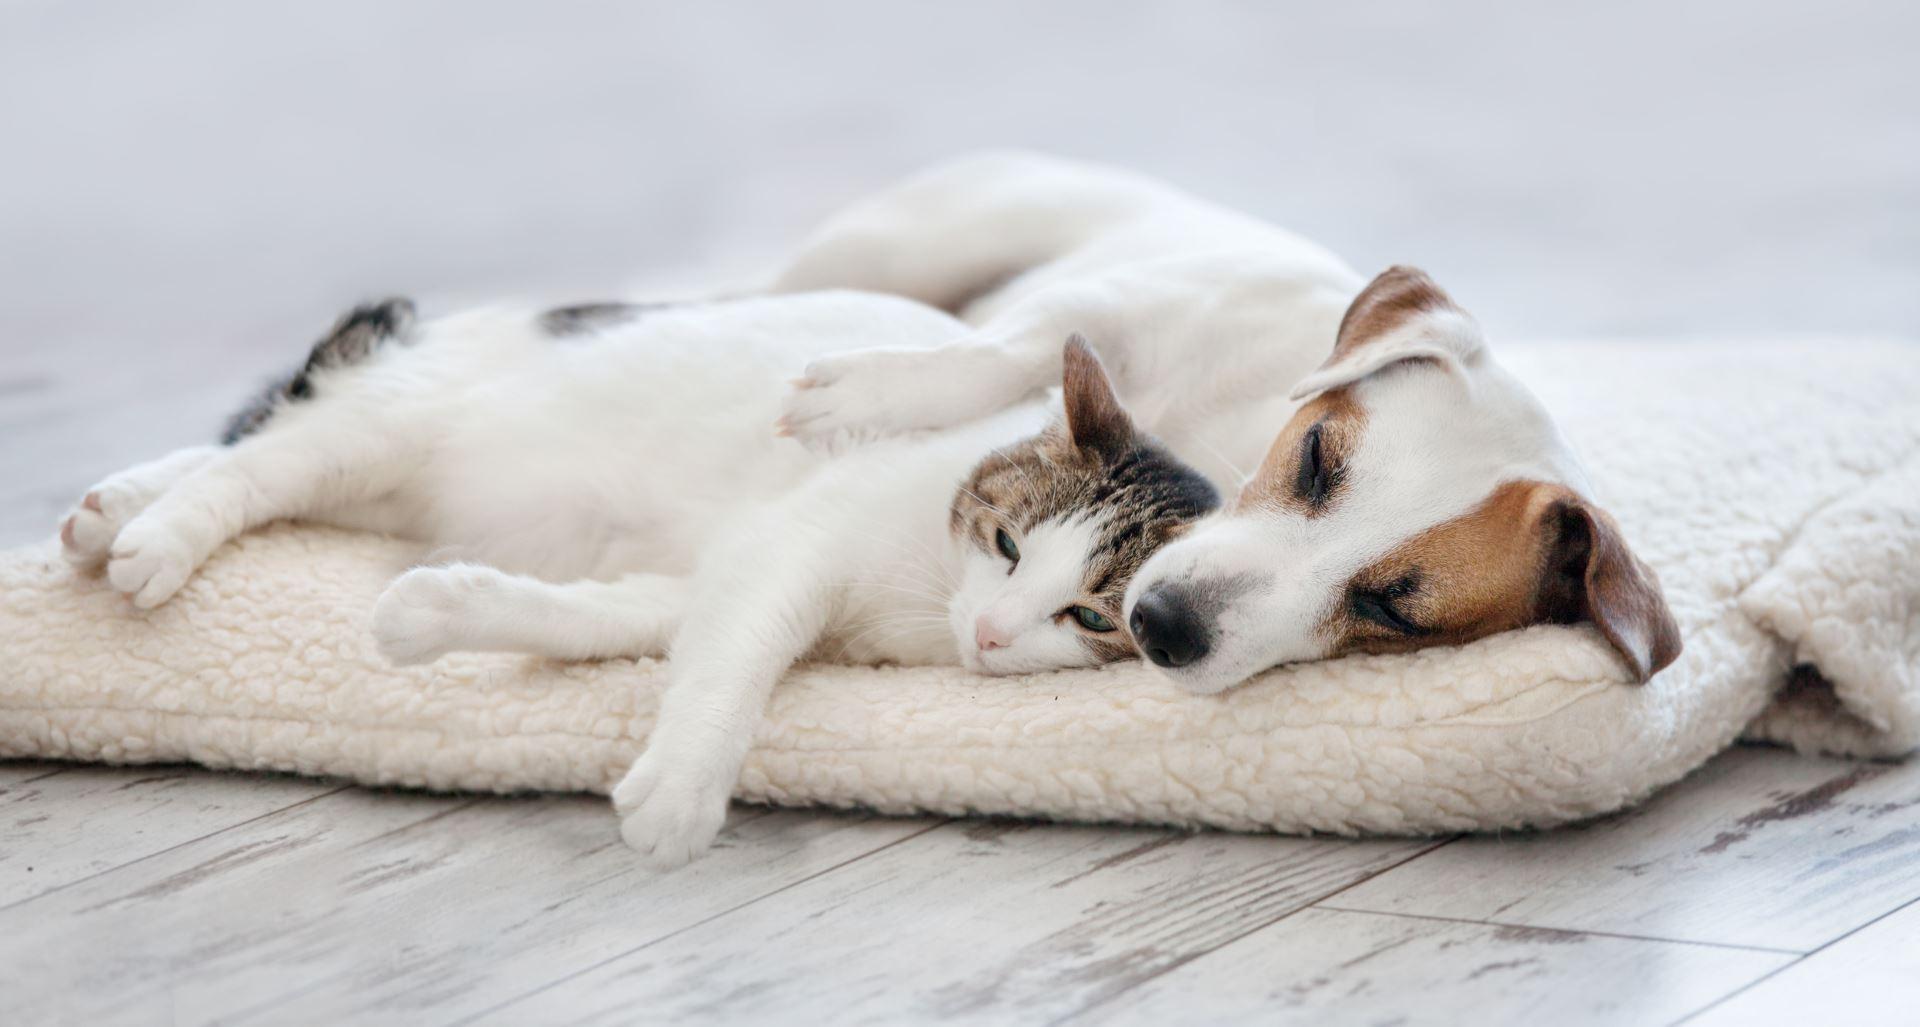 Cat And Dog Sleeping. Pets Sleeping Embracing